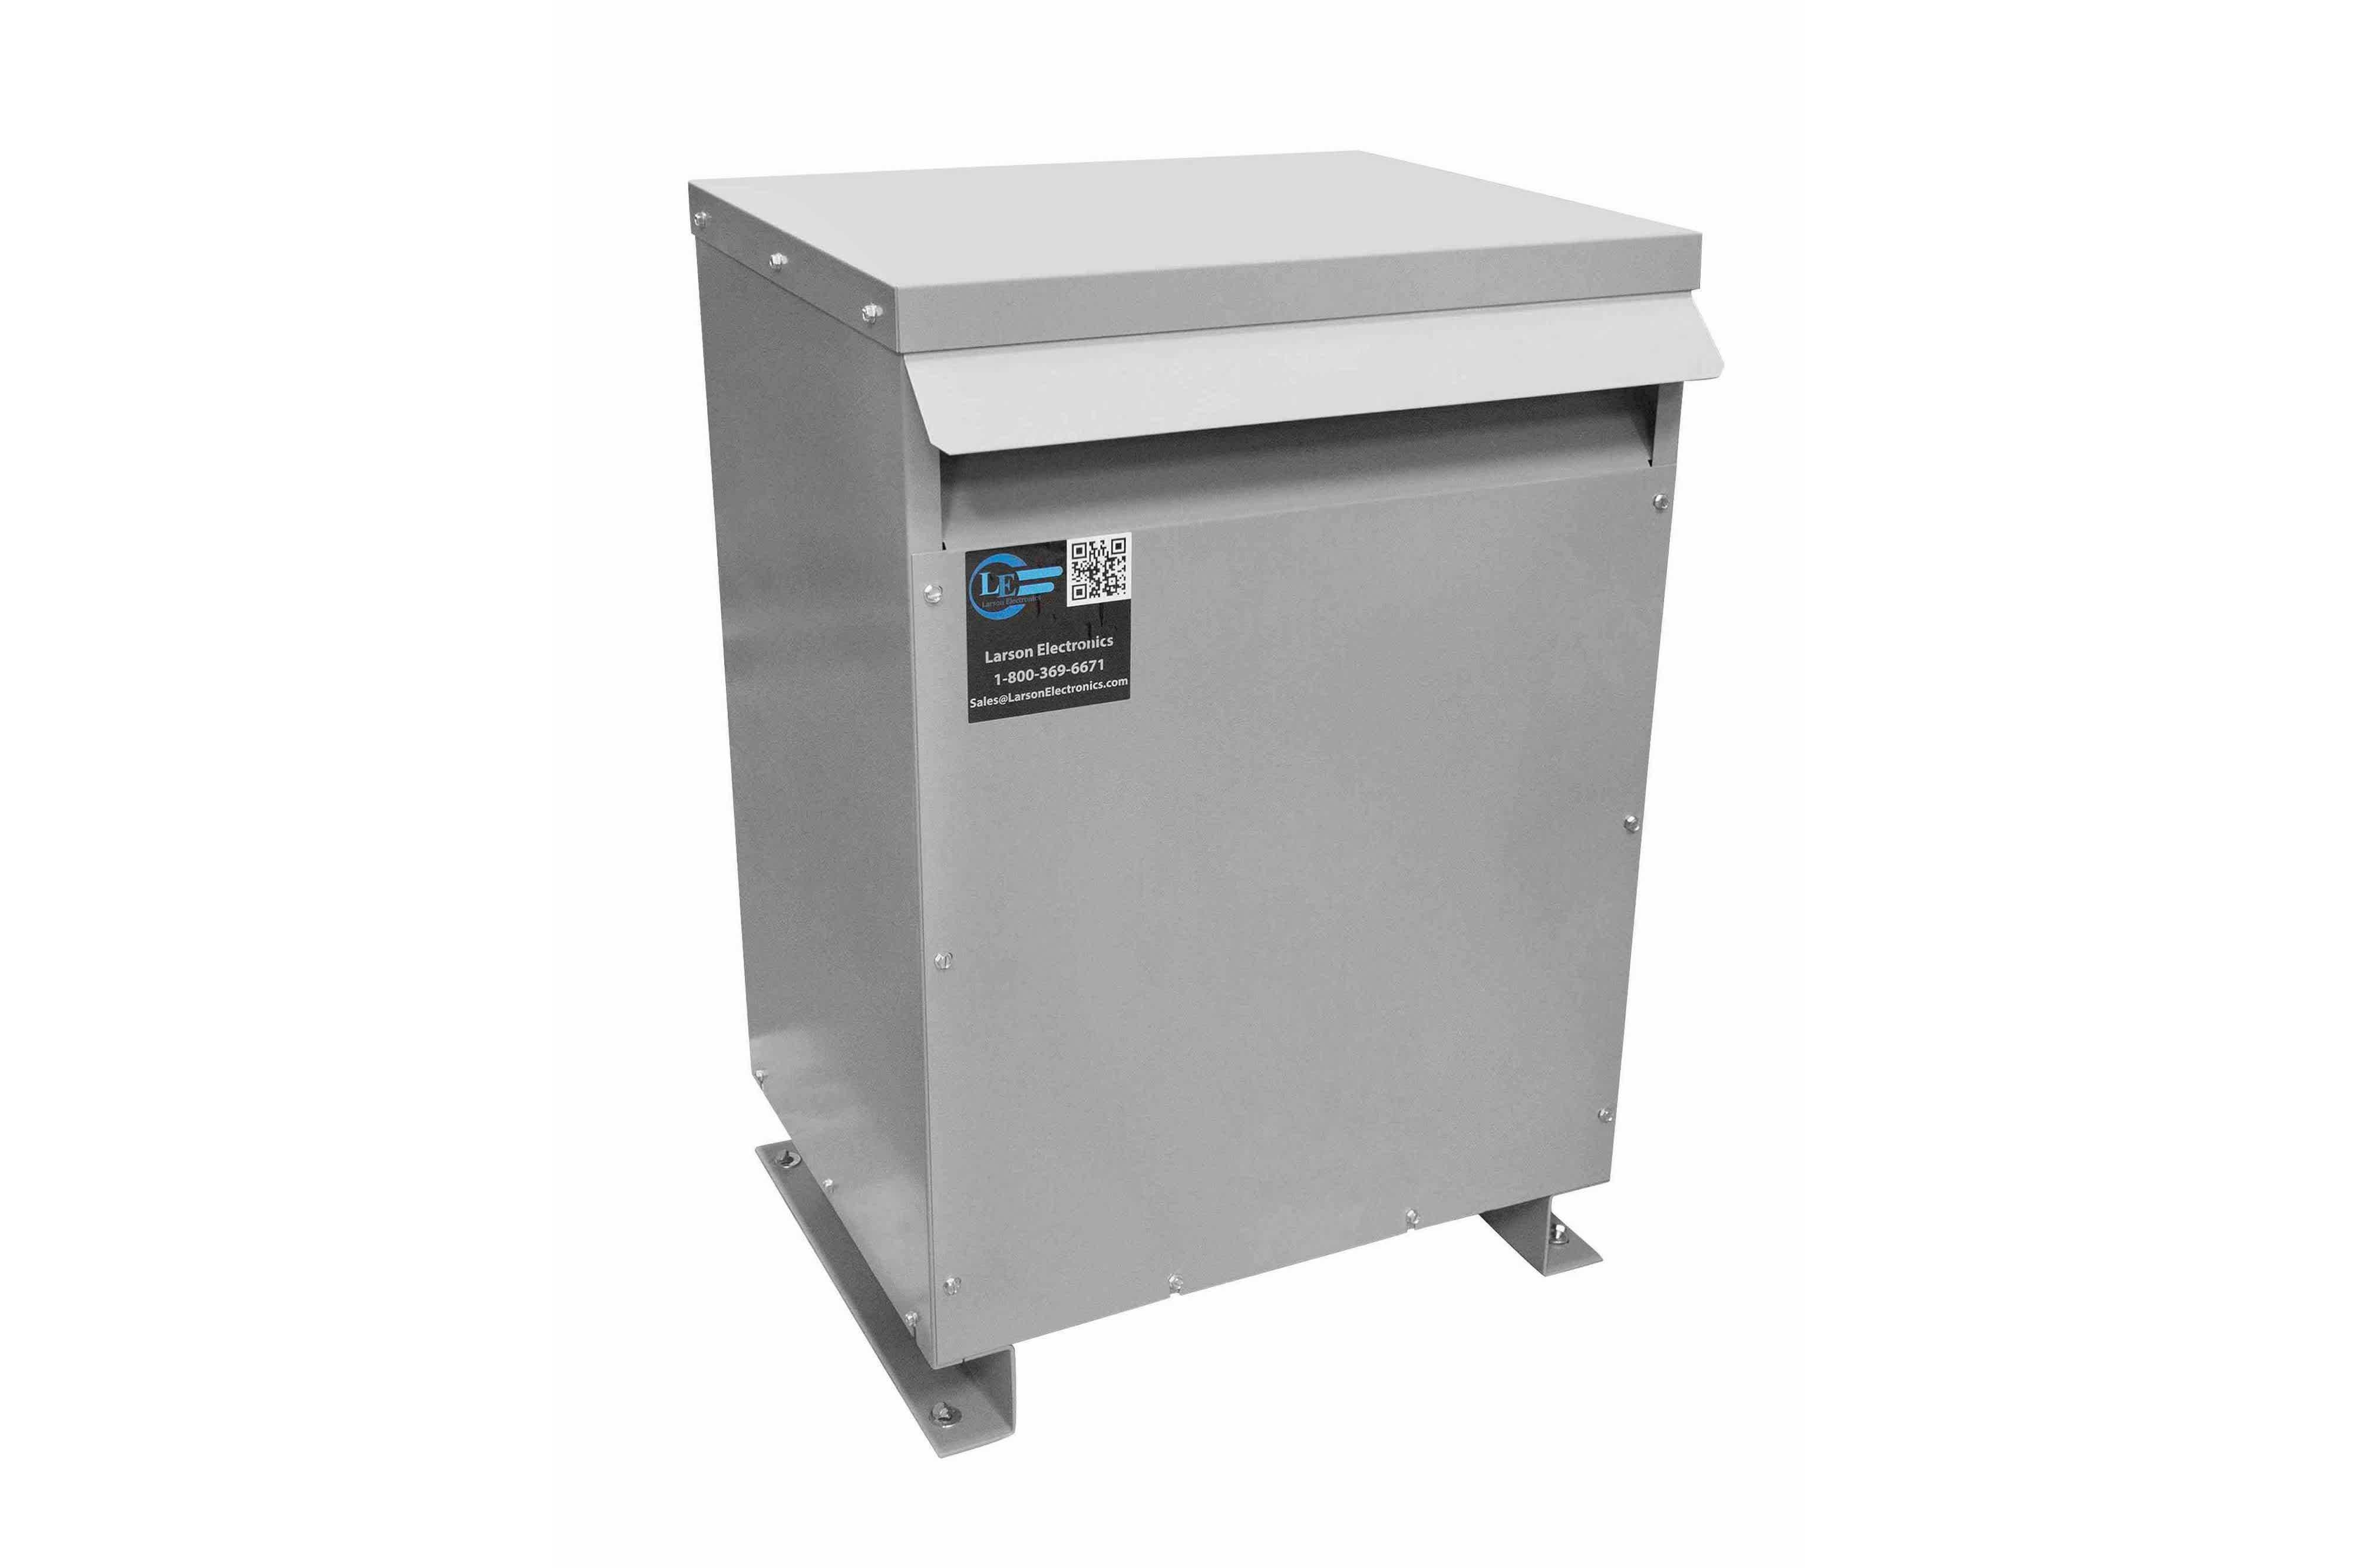 40 kVA 3PH Isolation Transformer, 240V Wye Primary, 600V Delta Secondary, N3R, Ventilated, 60 Hz